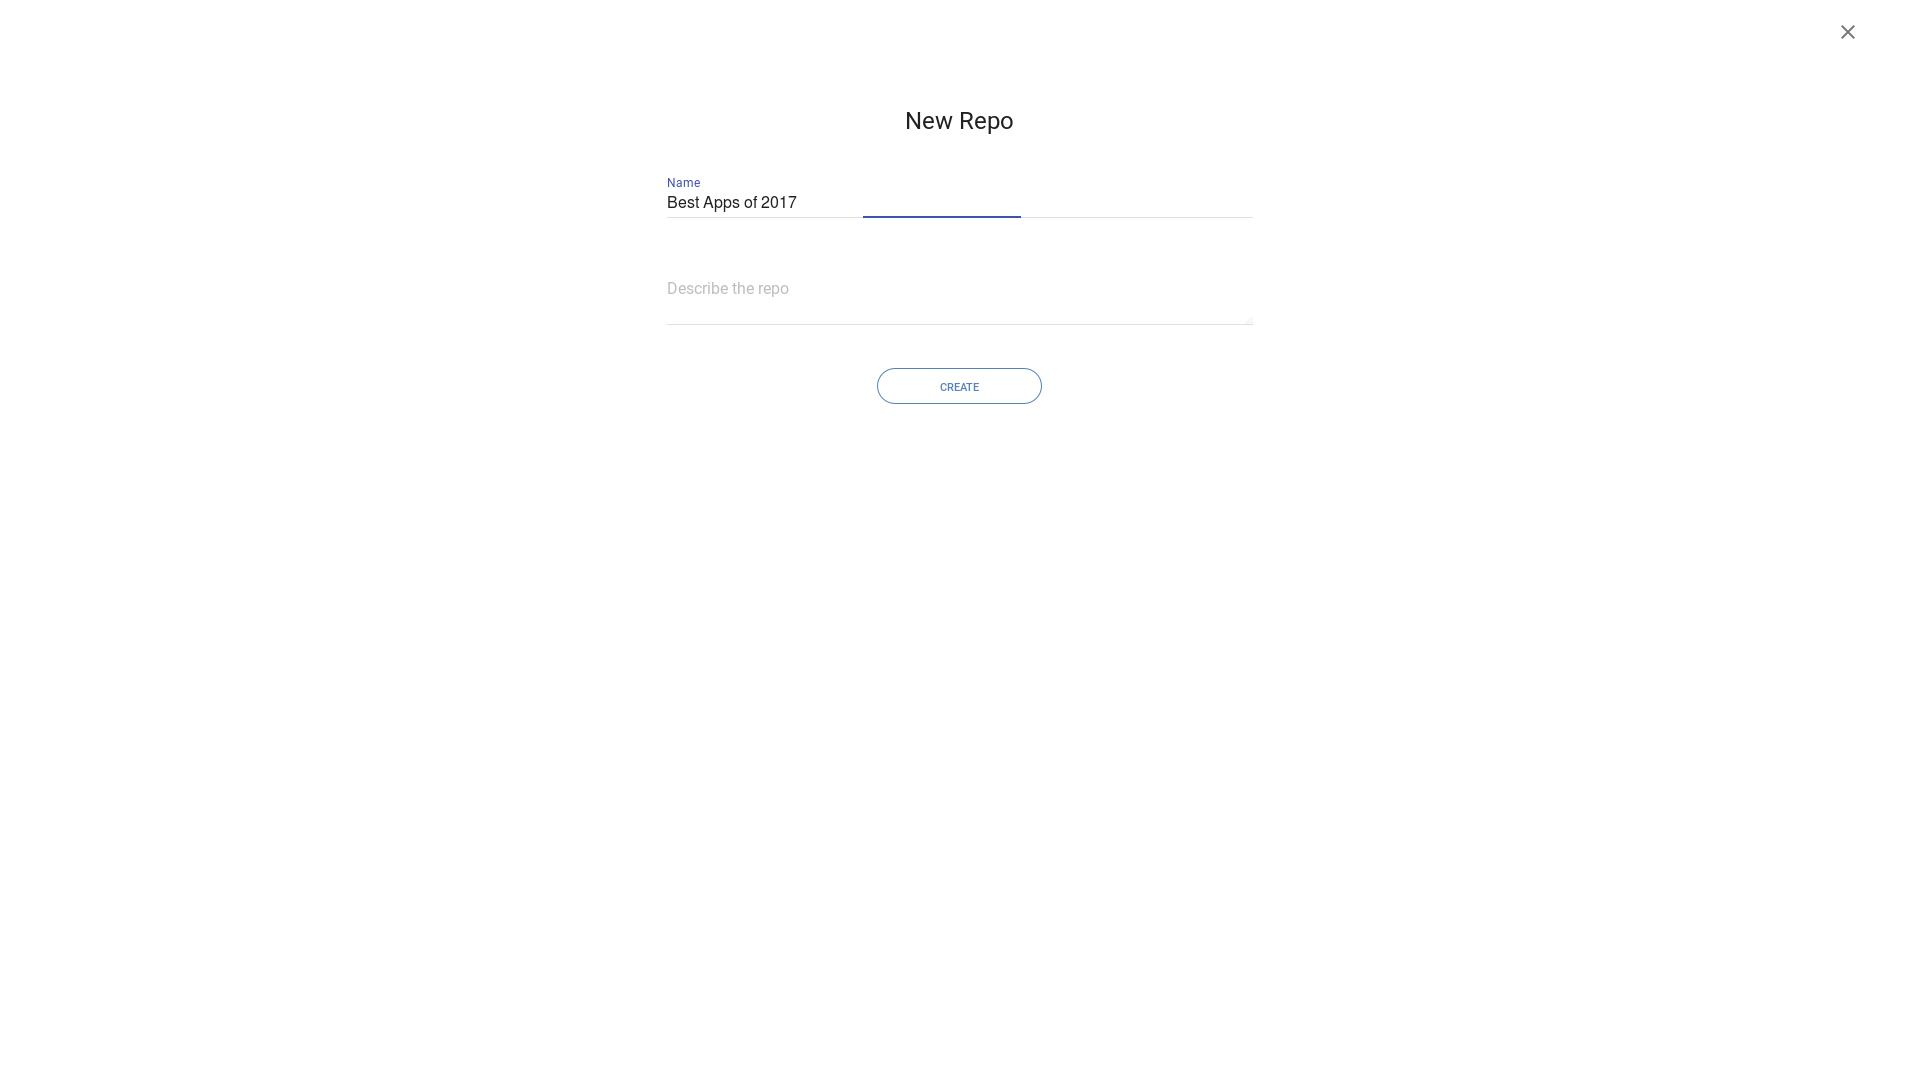 assets/repomaker-screenshots/create-repo.png